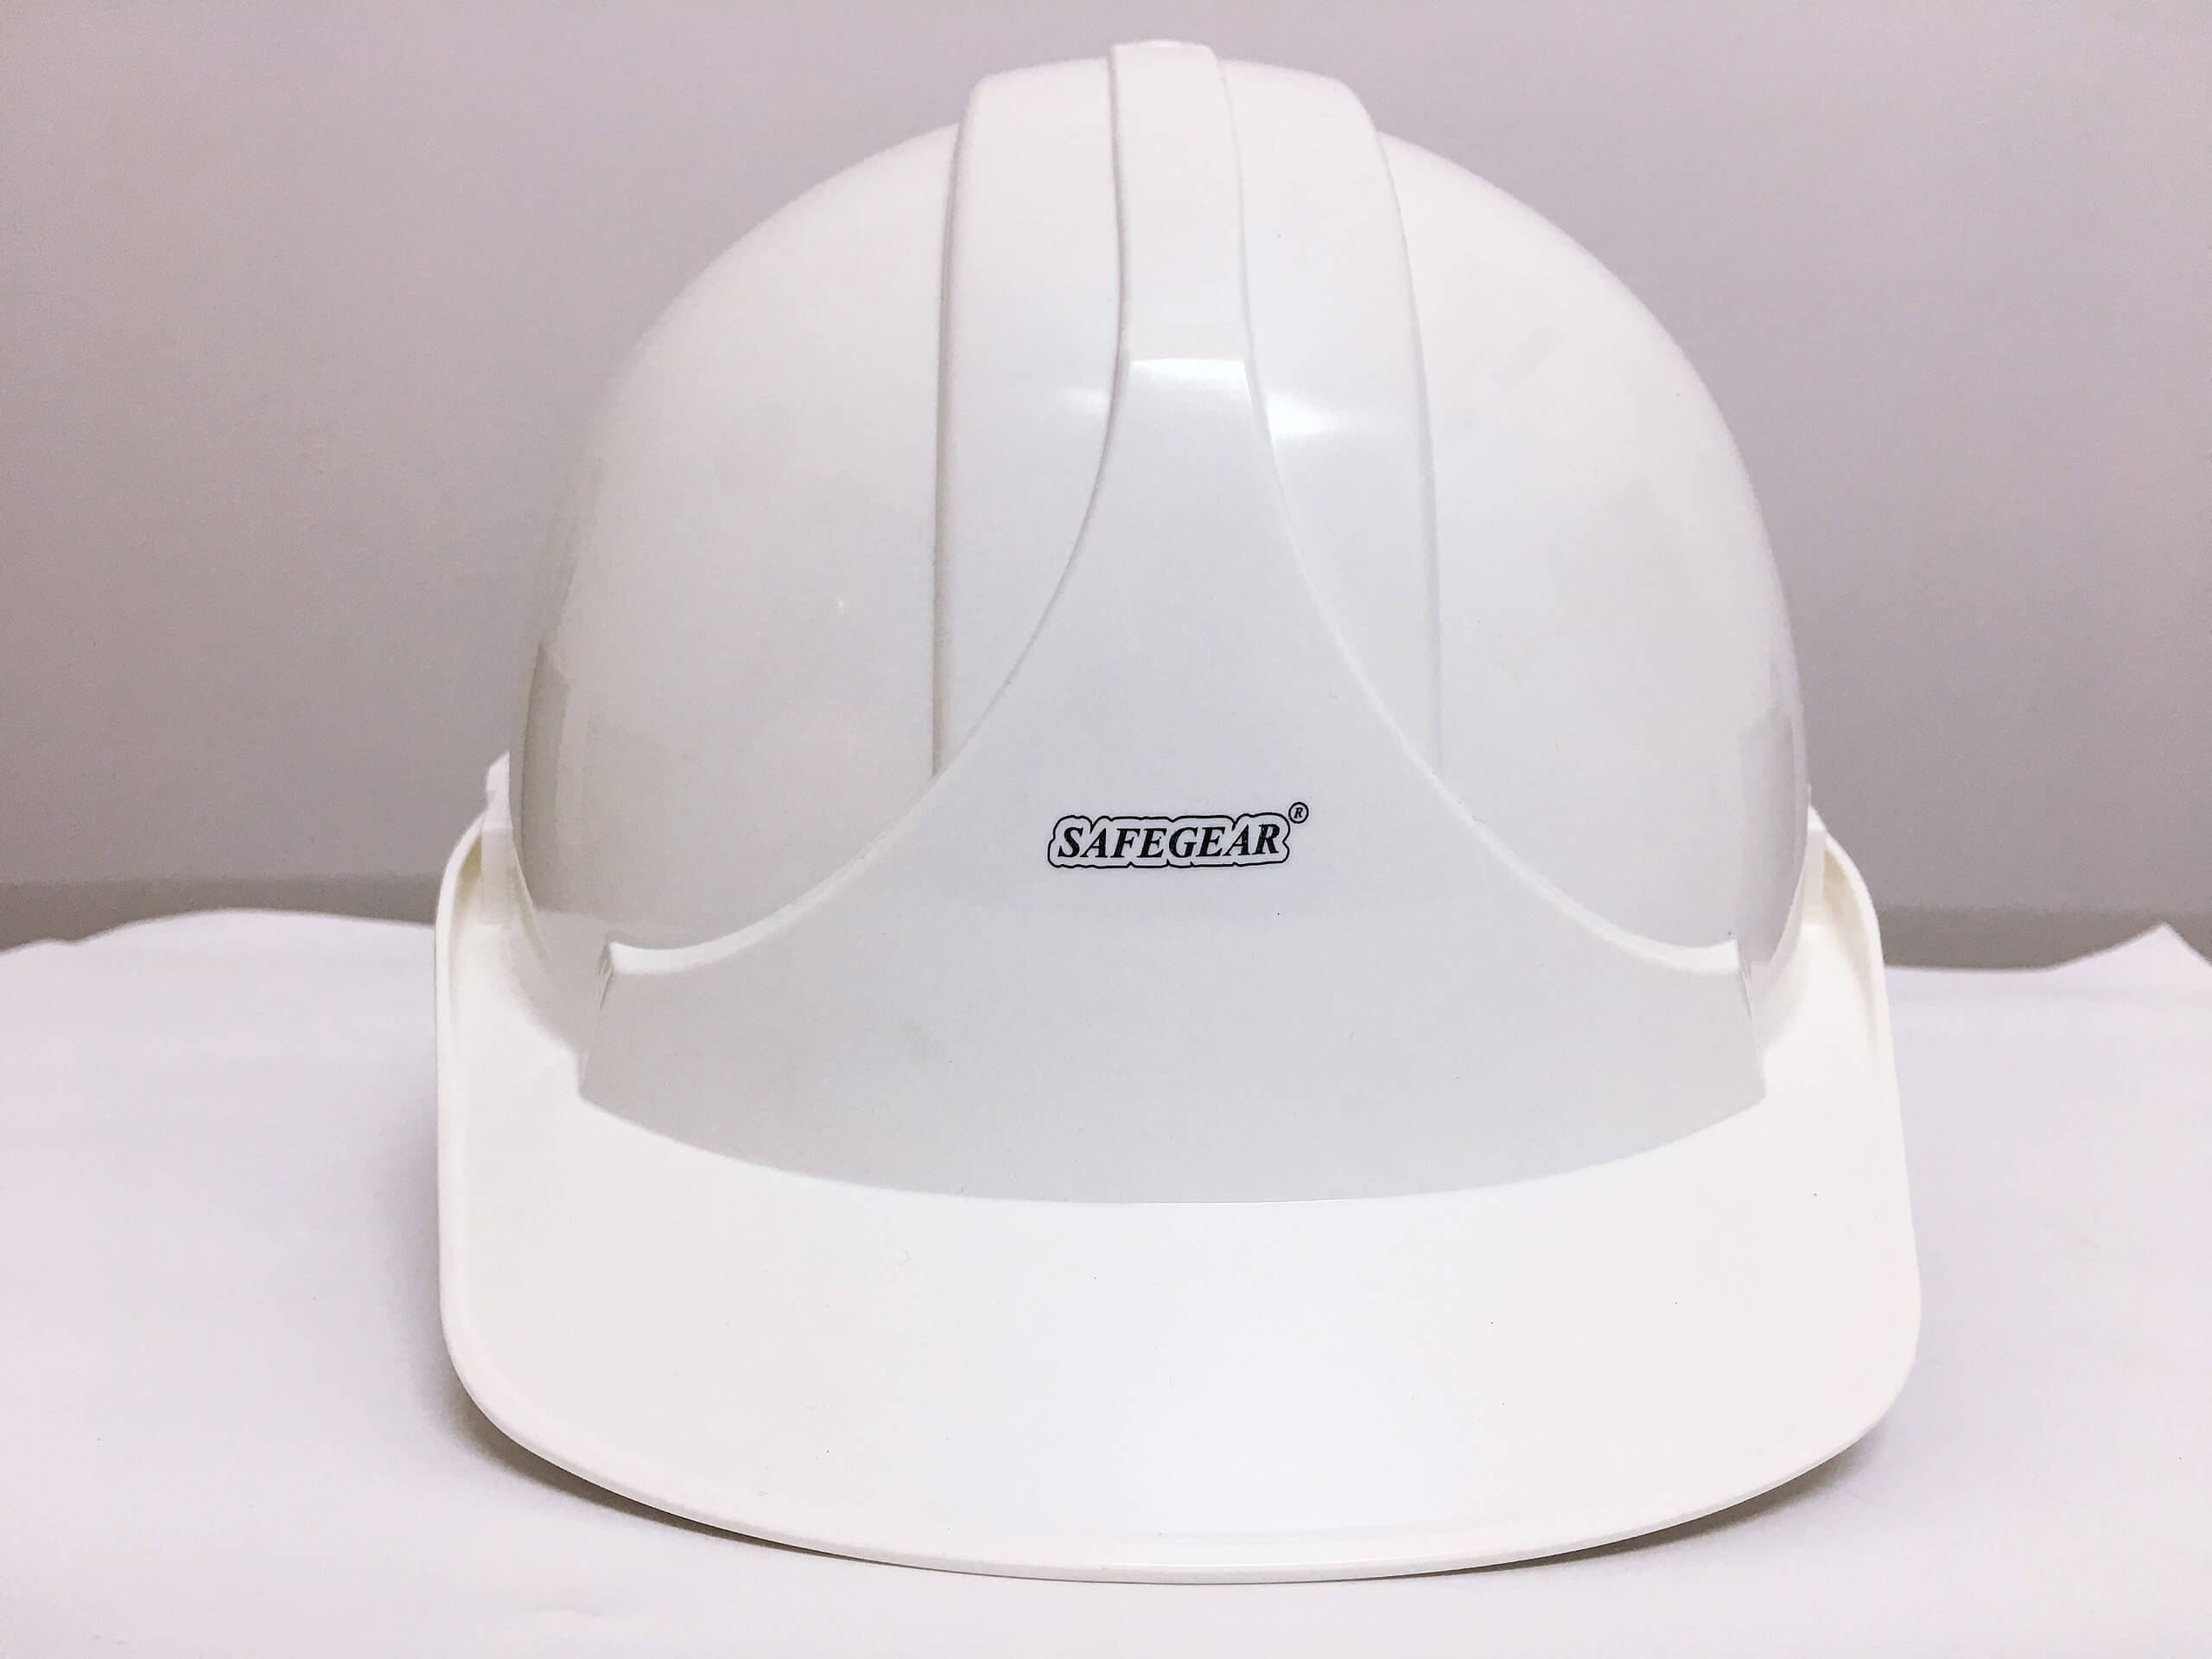 Mũ bảo hộ lao động Safegear Đài Loan